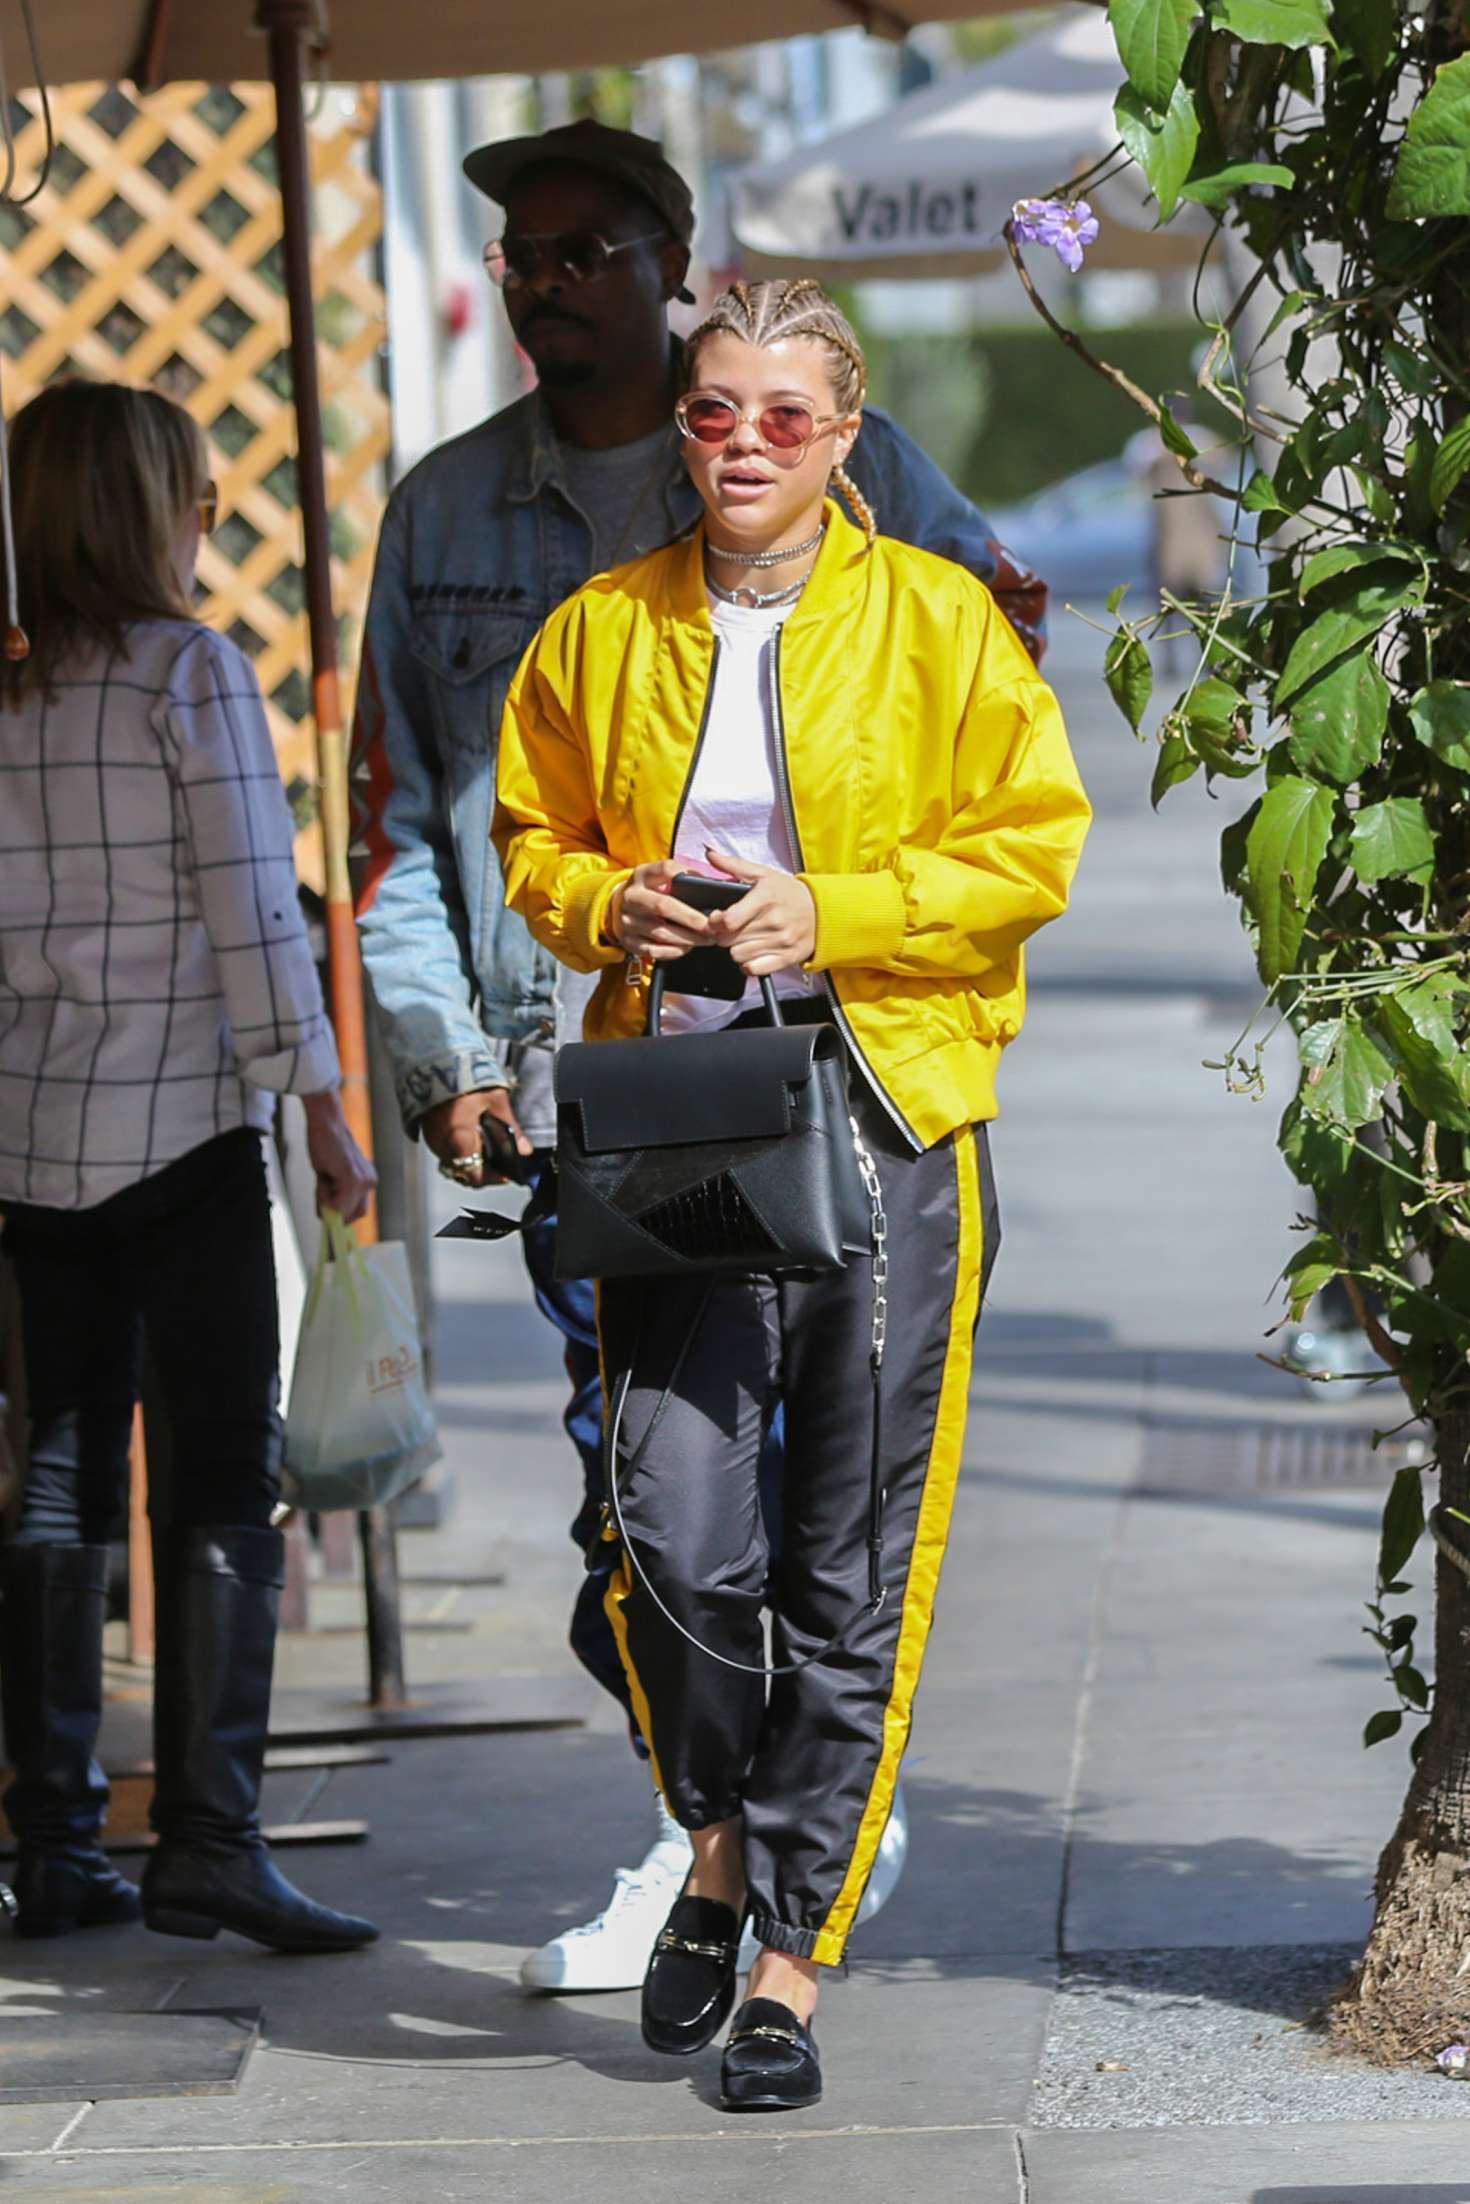 Sofia Richie 2017 : Sofia Richie at Il Pastaio in Beverly Hills -01